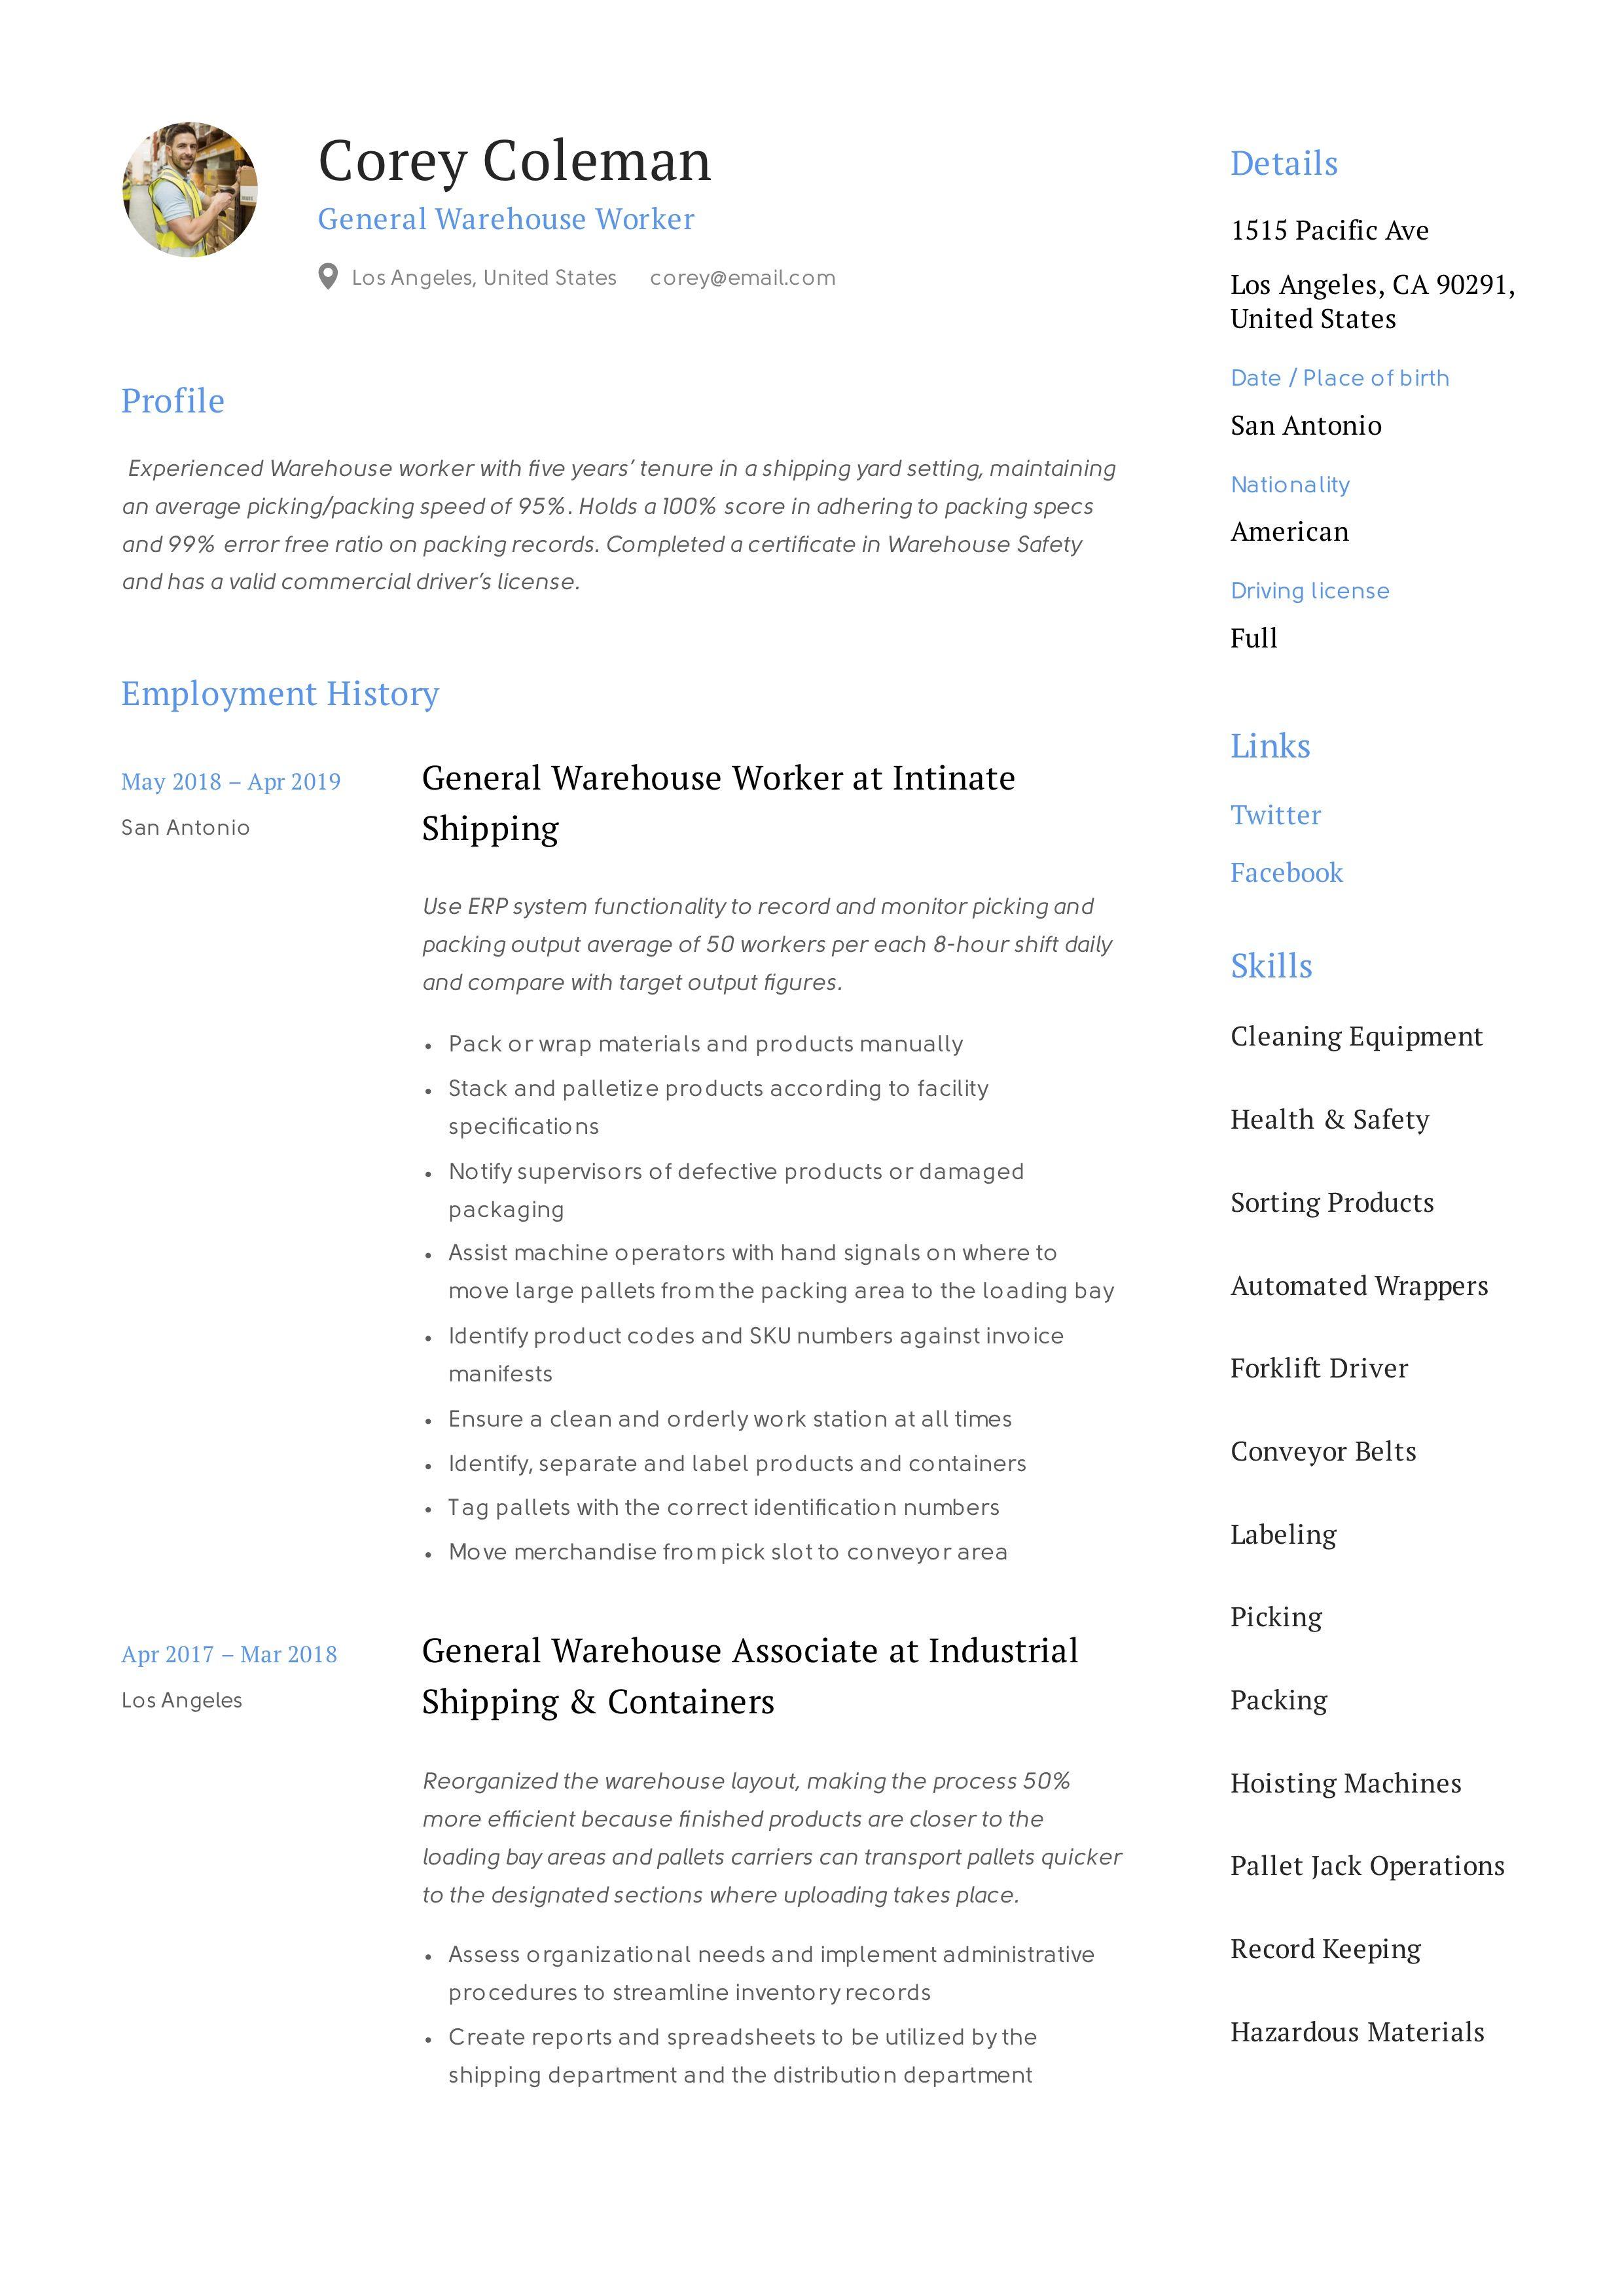 General warehouse worker resume template in 2020